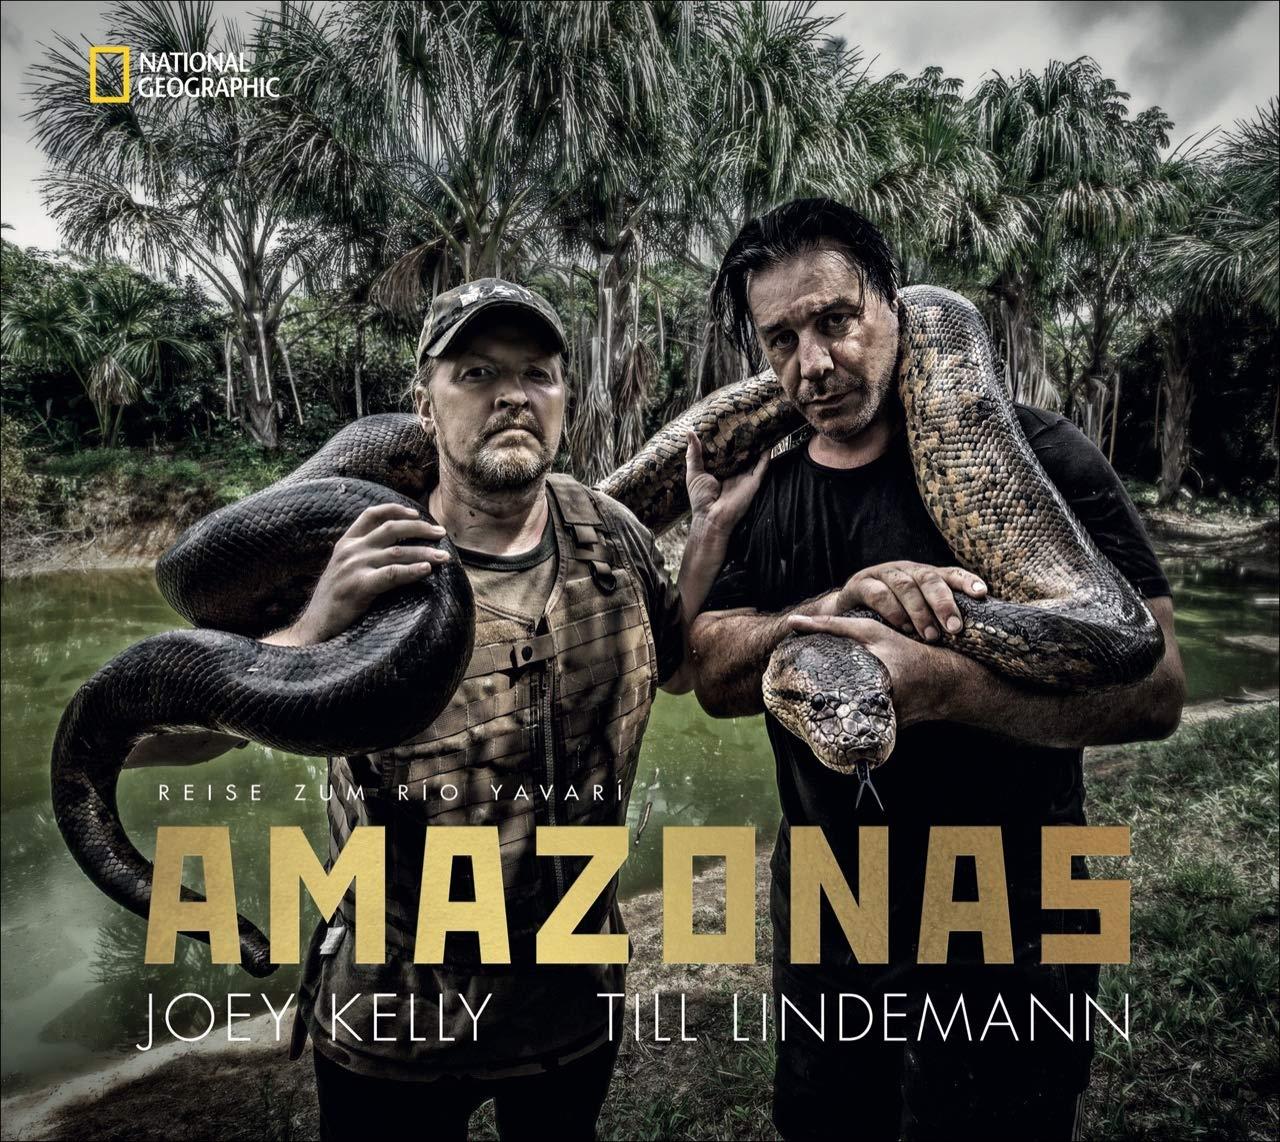 Amazonas: Reise zum Rio Javari | Amazon.com.br